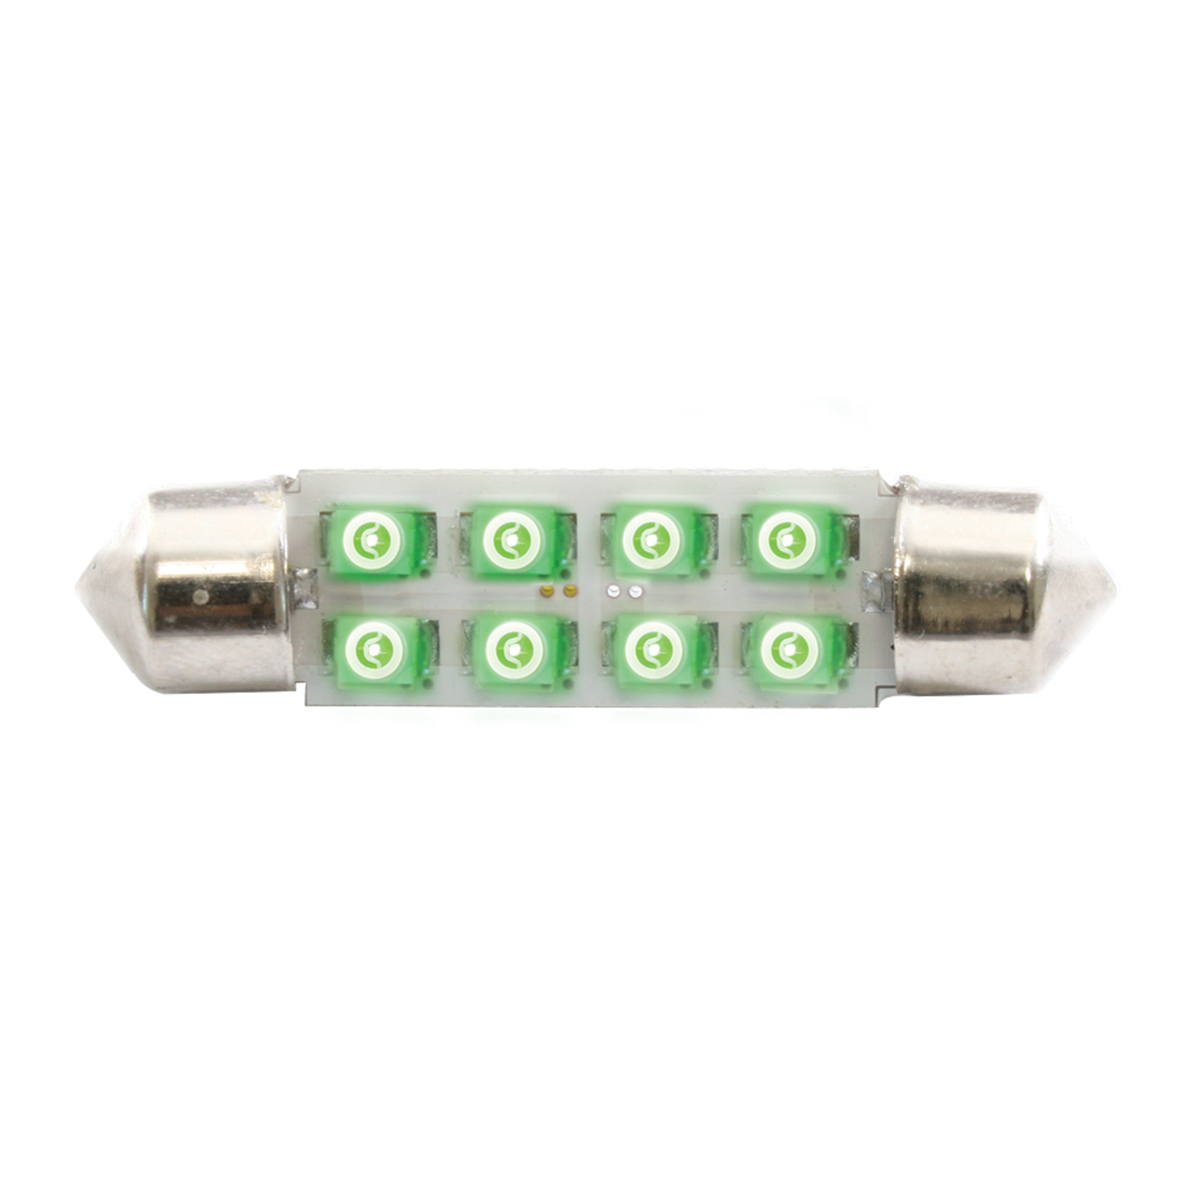 77152 Green 211-2 Dome Type 8 LED Light Bulb